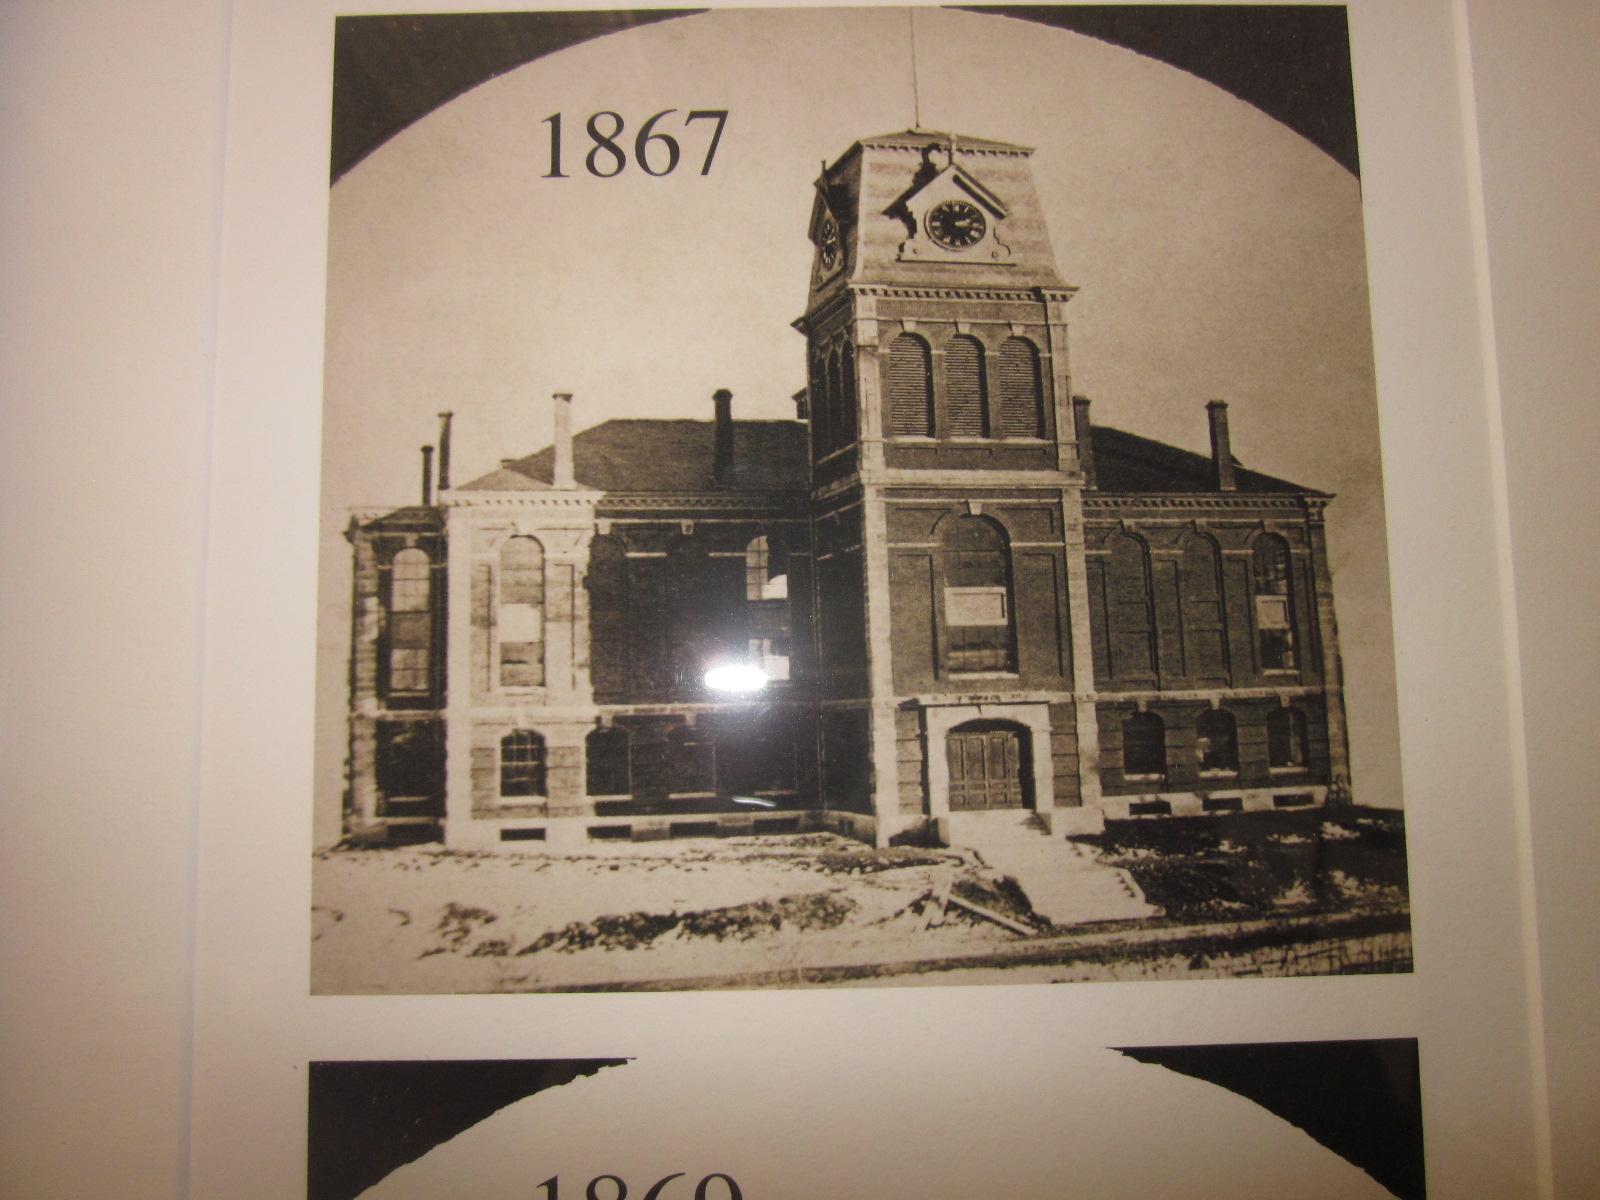 Gloucester mass evolution of City Hall_Office of Mayor (2)